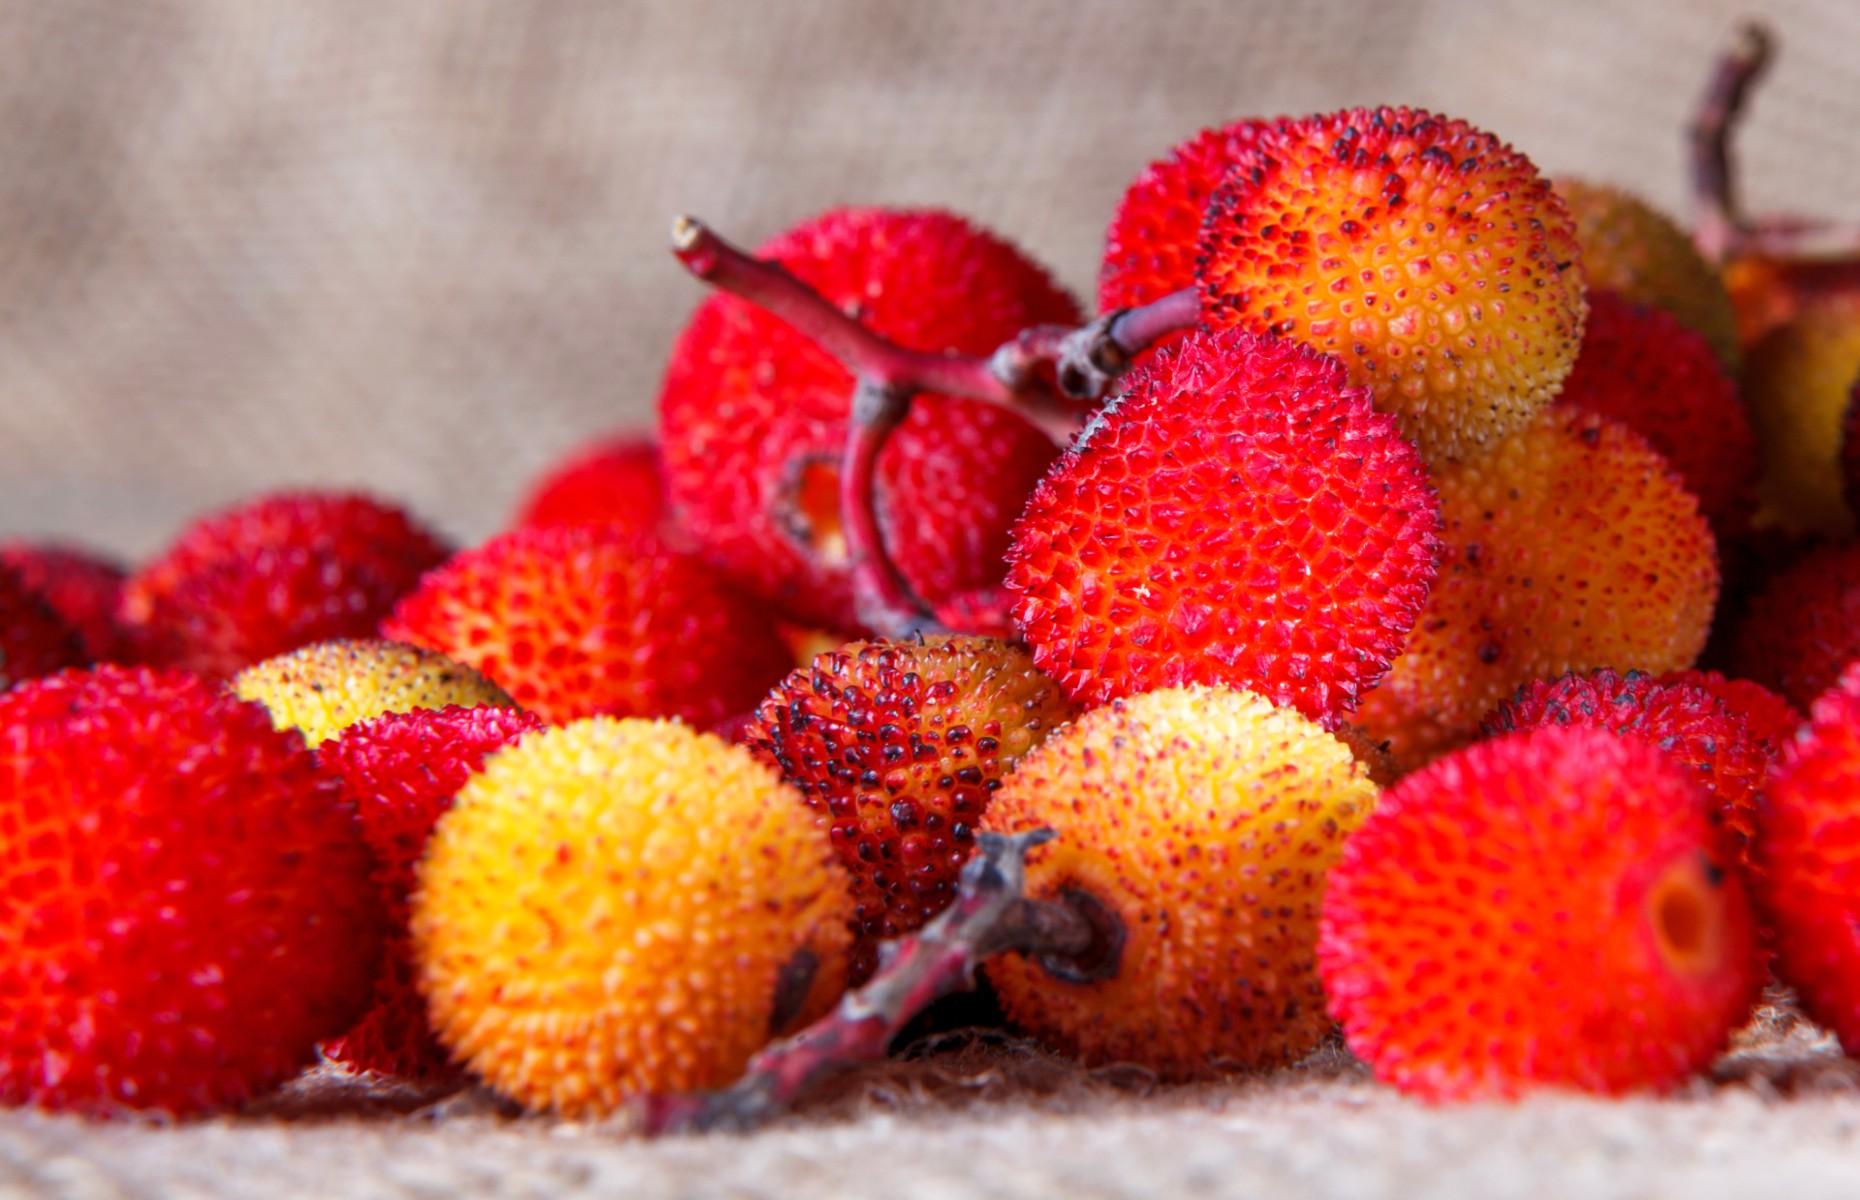 Medronho berries (Image: Francisco Duarte Mendes/Shutterstock)